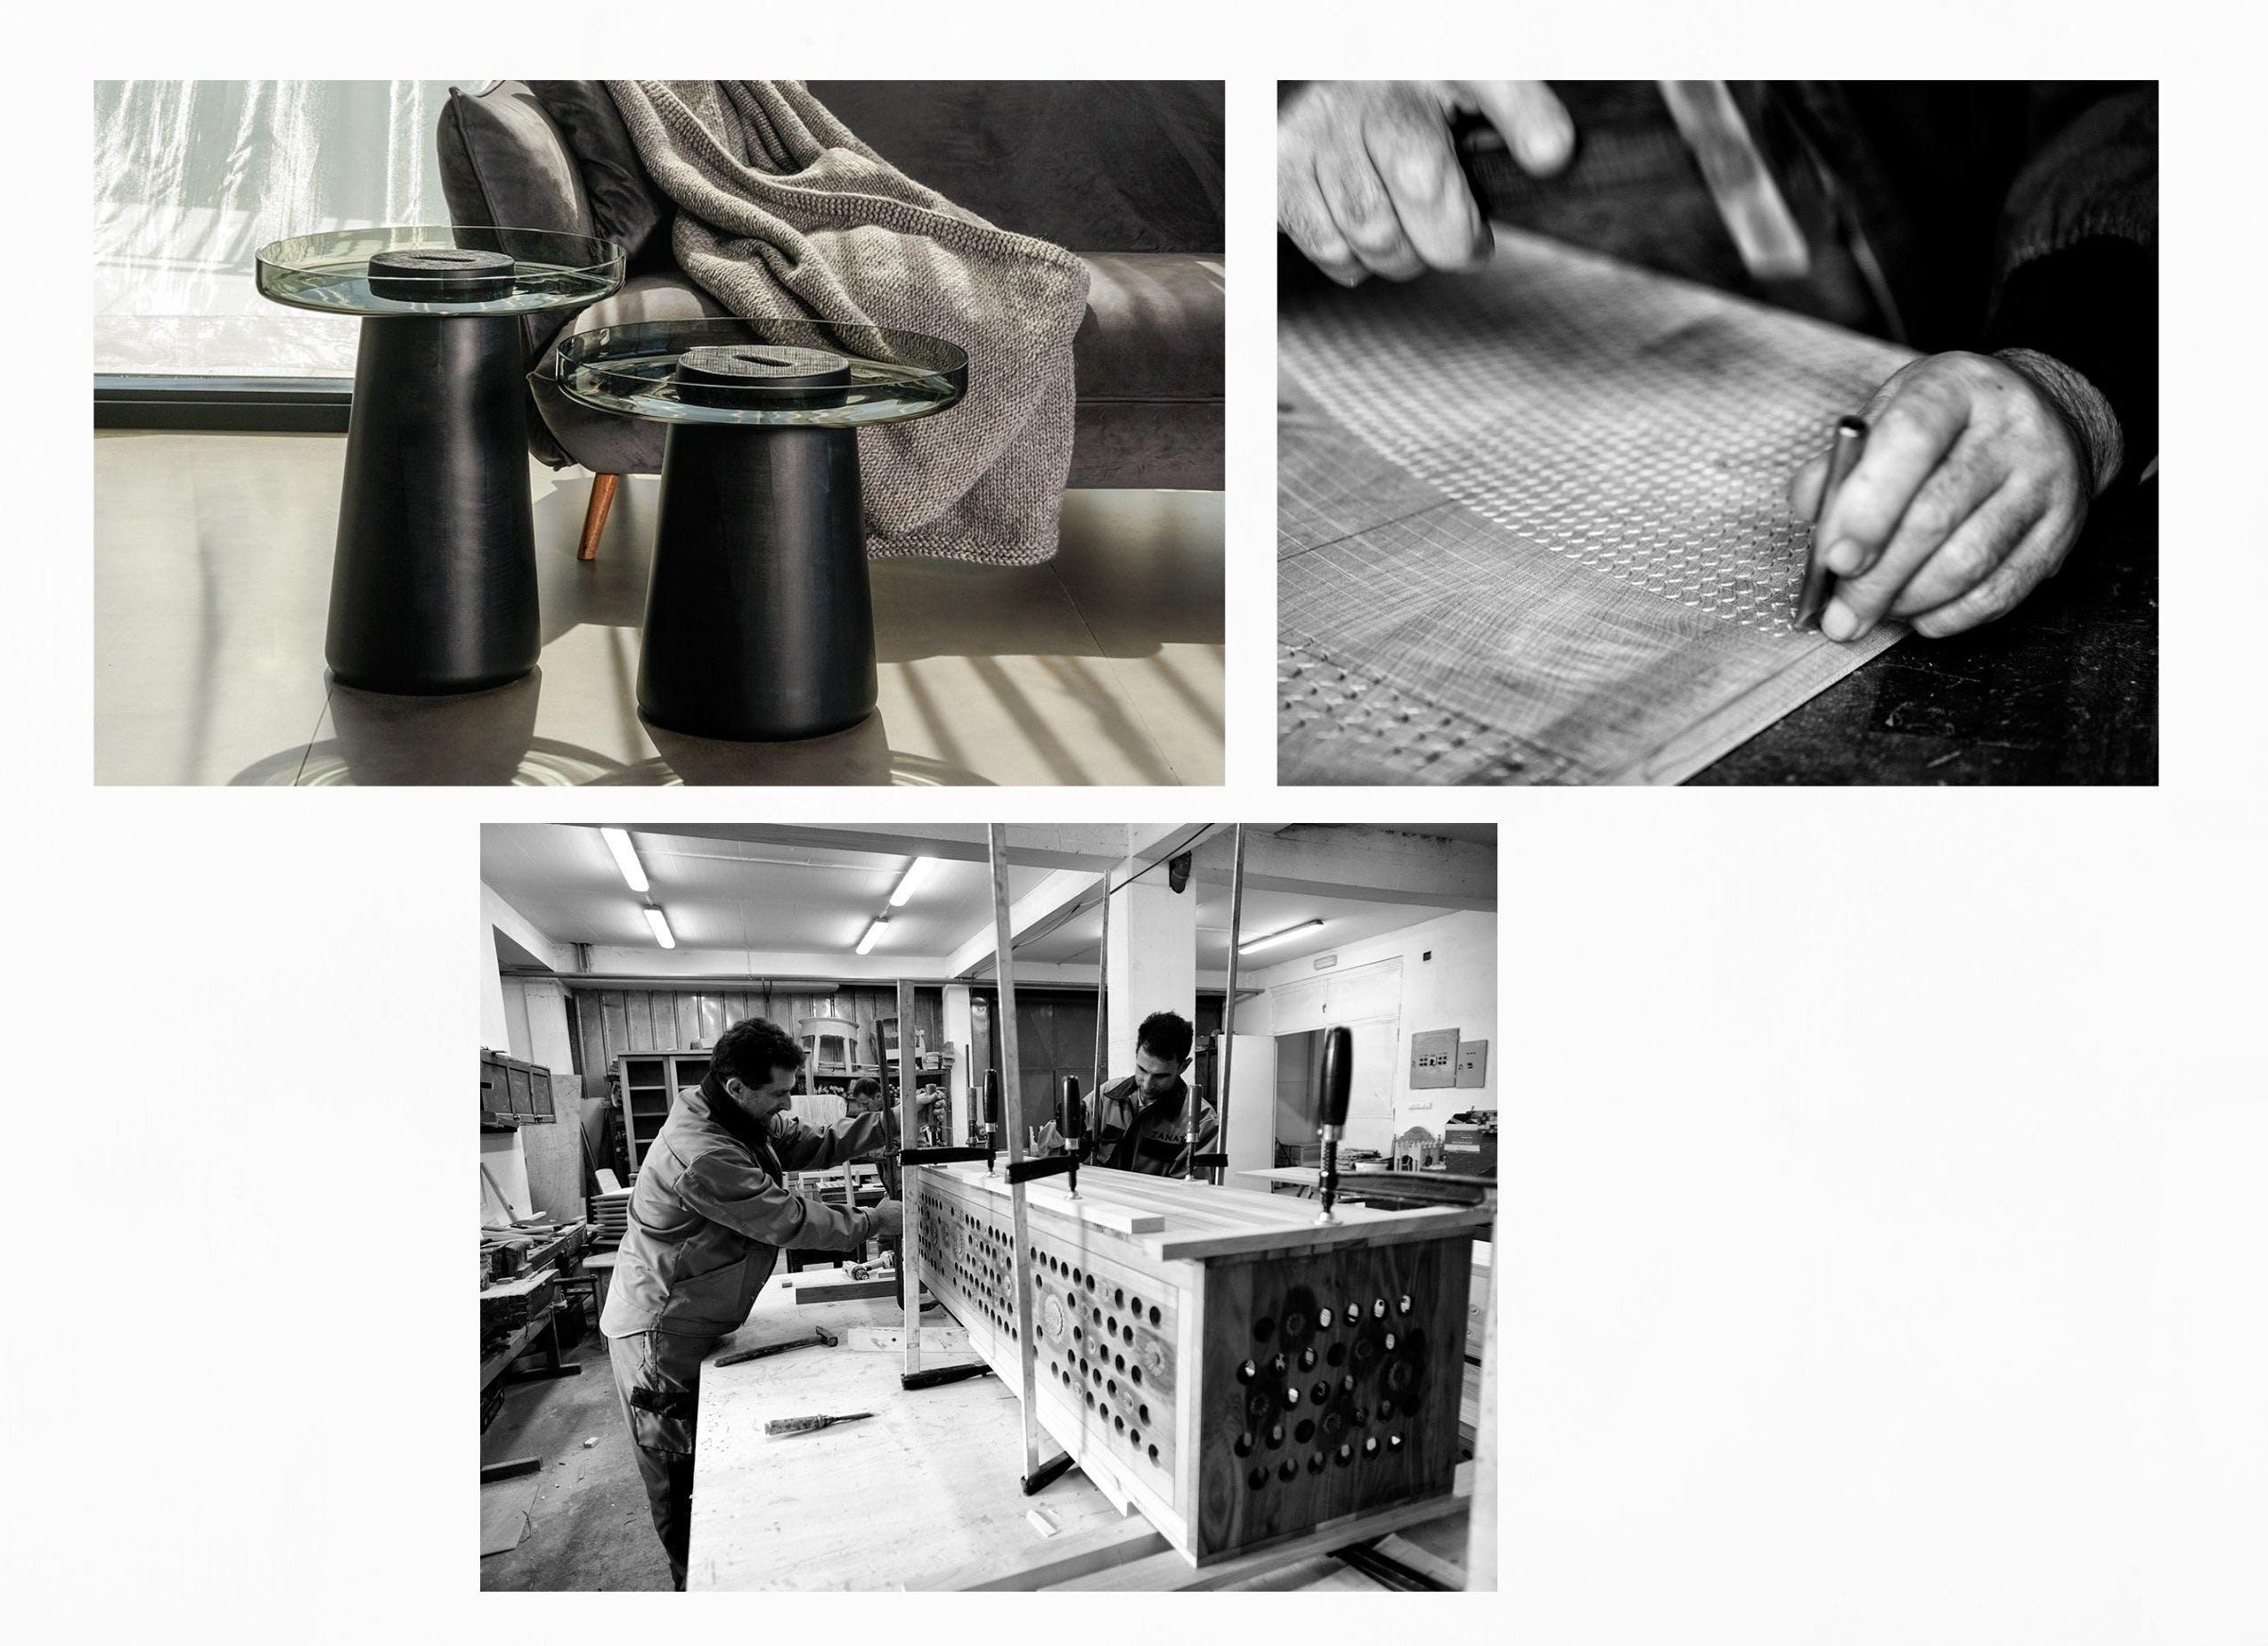 Zanat craftsmen image